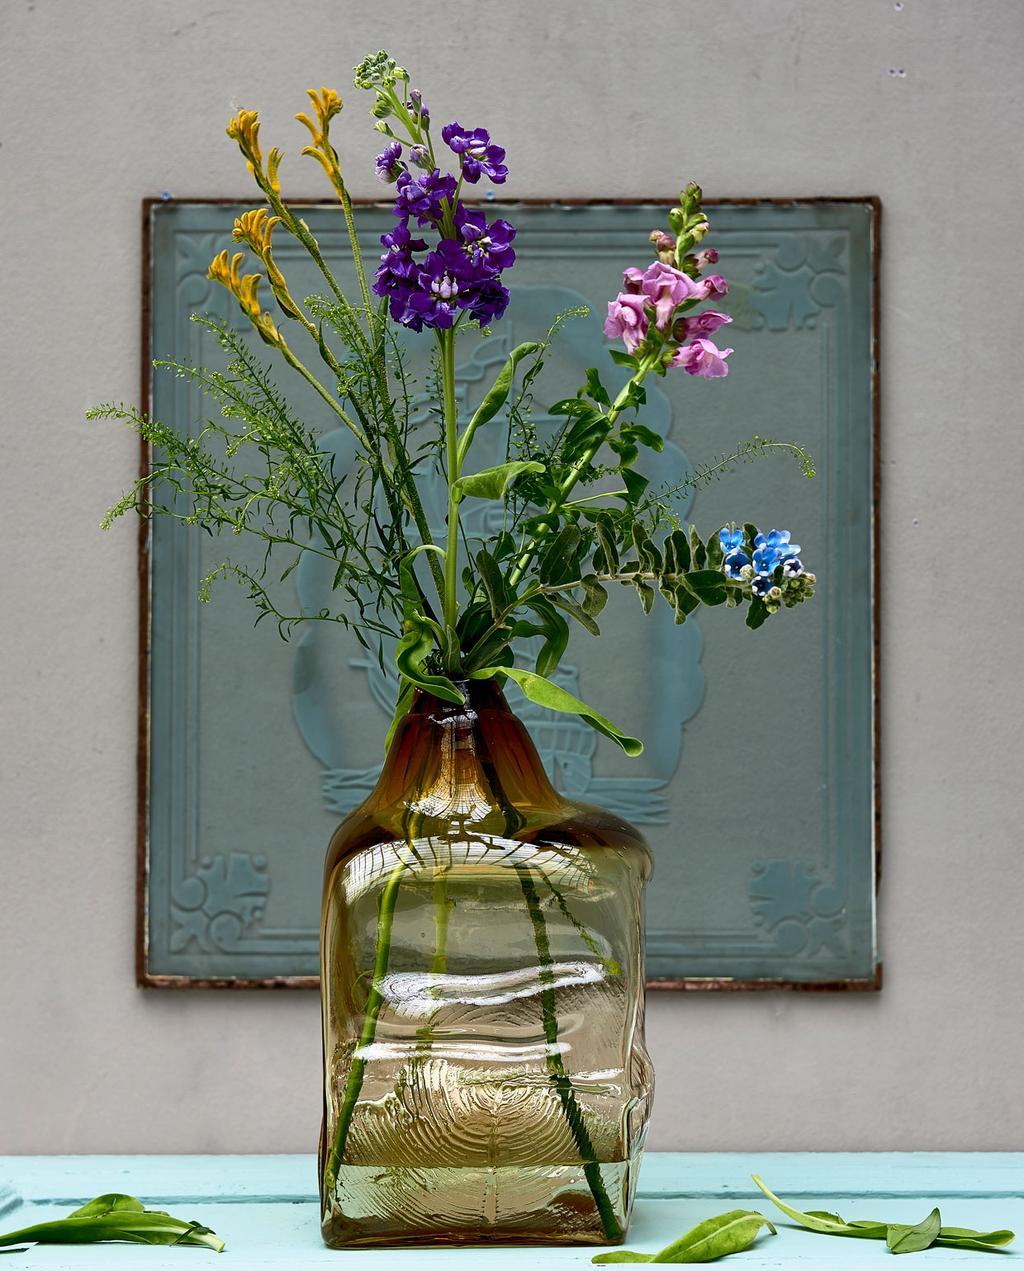 vtwonen | styling glas transparant vaas met bloemen